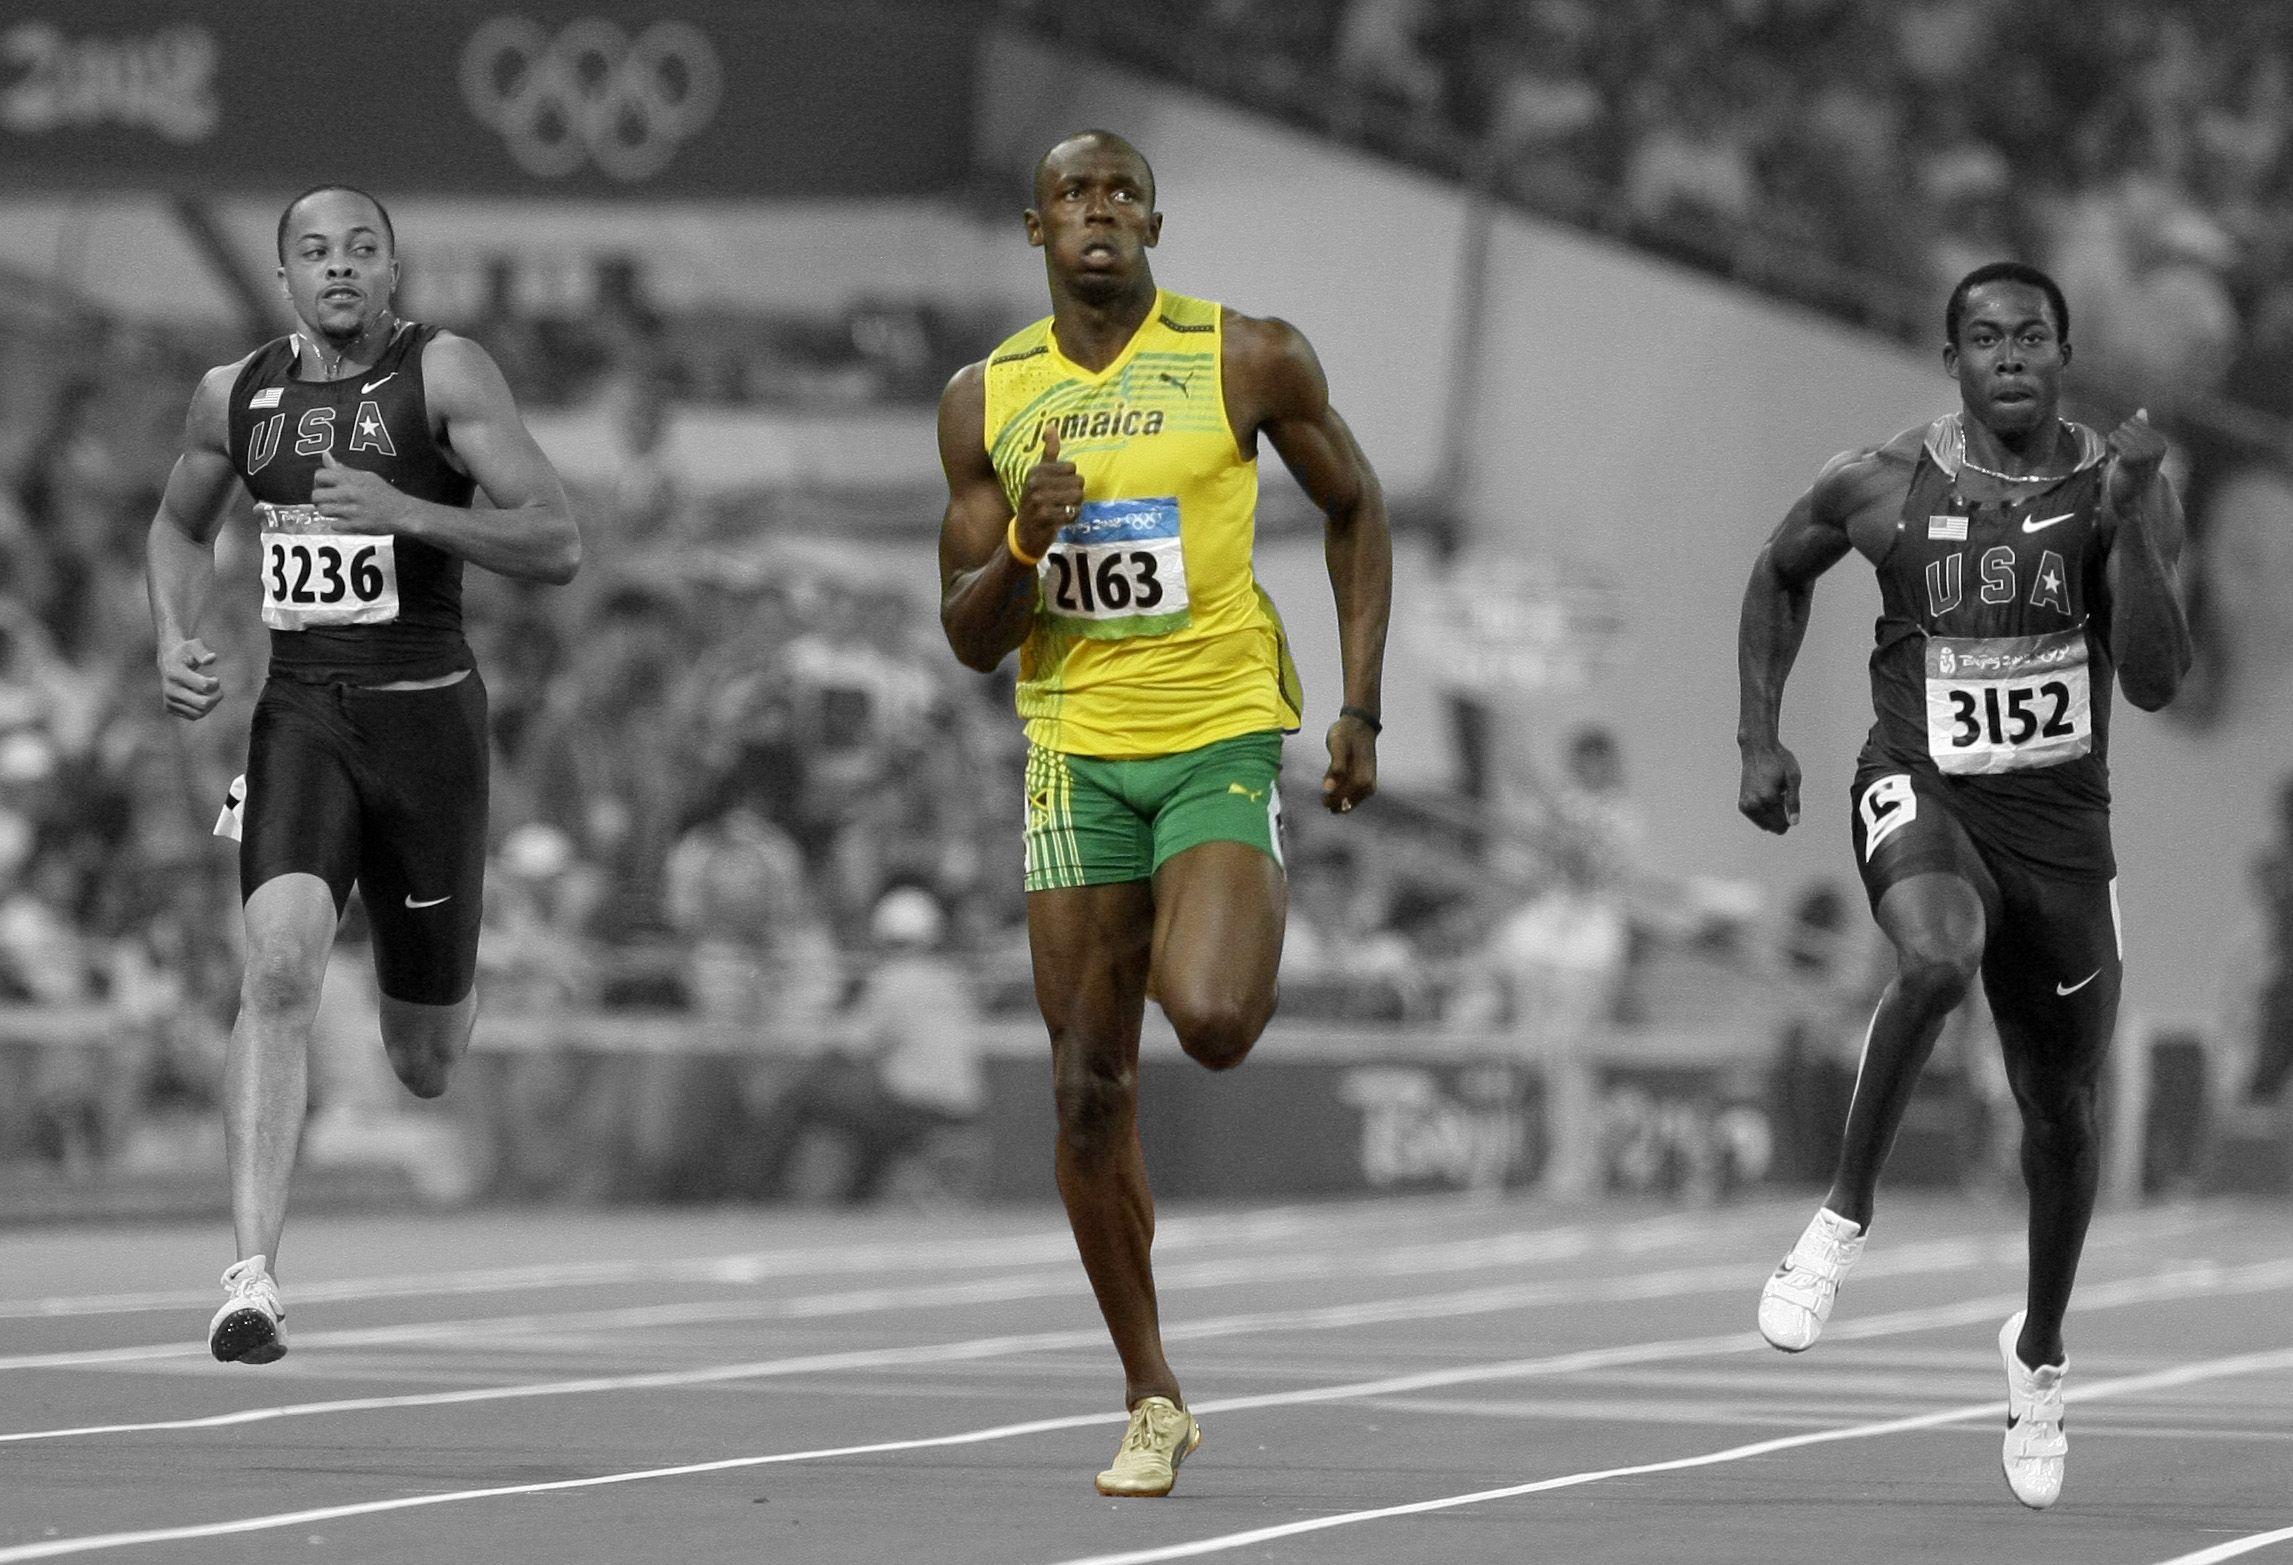 Usain Bolt Png Pesquisa Google Usain Bolt Usain Bolt Running Olympics